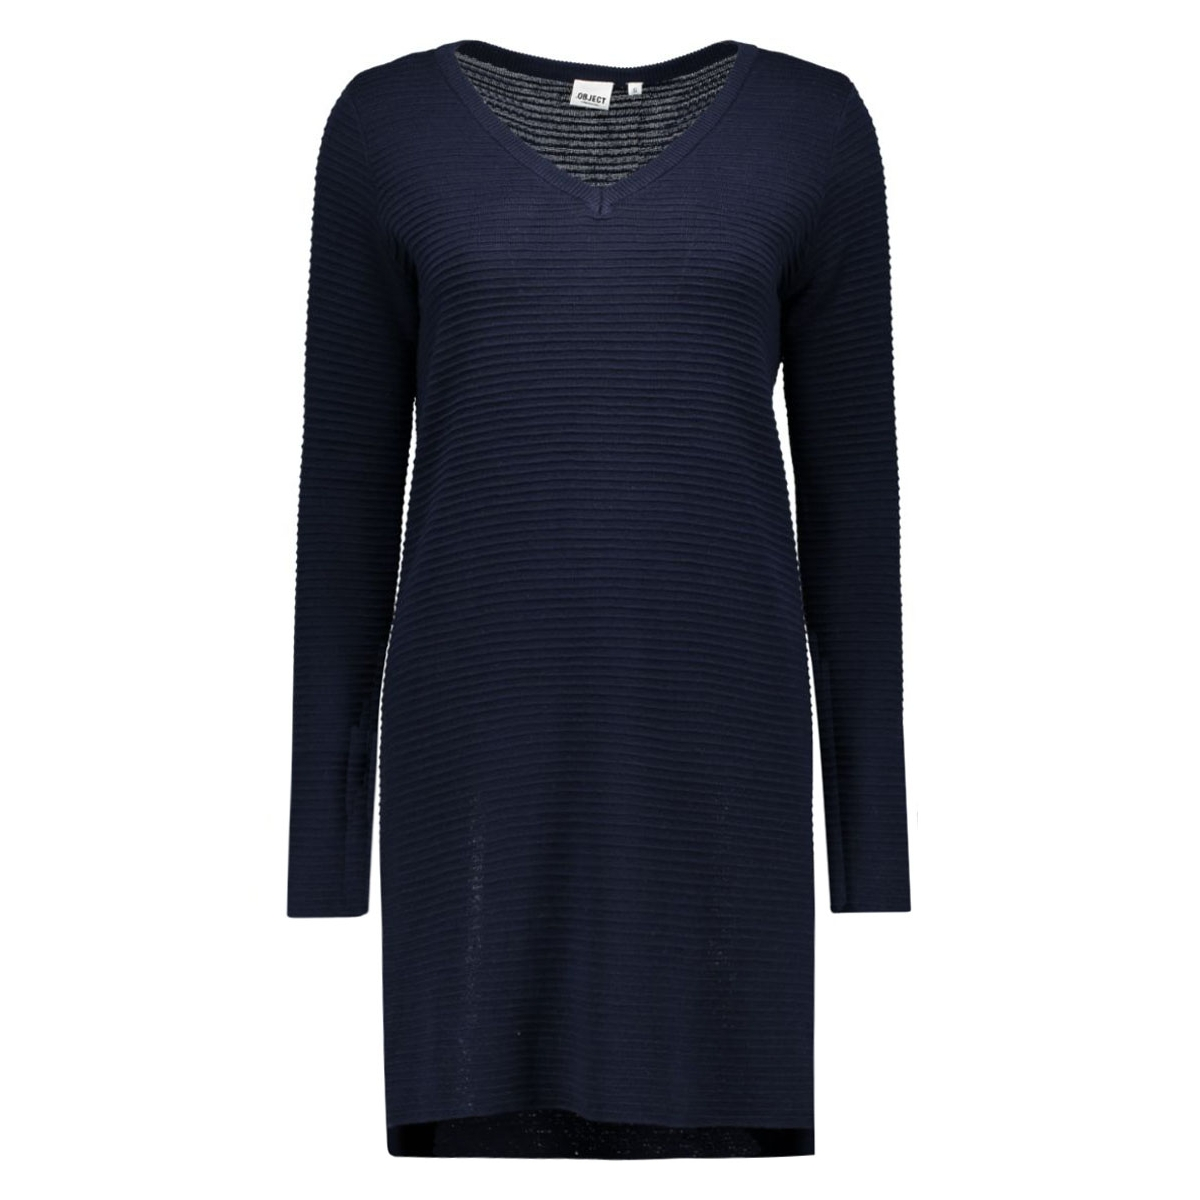 objnadine l/s knit dress noos 23023212 object jurk sky captain